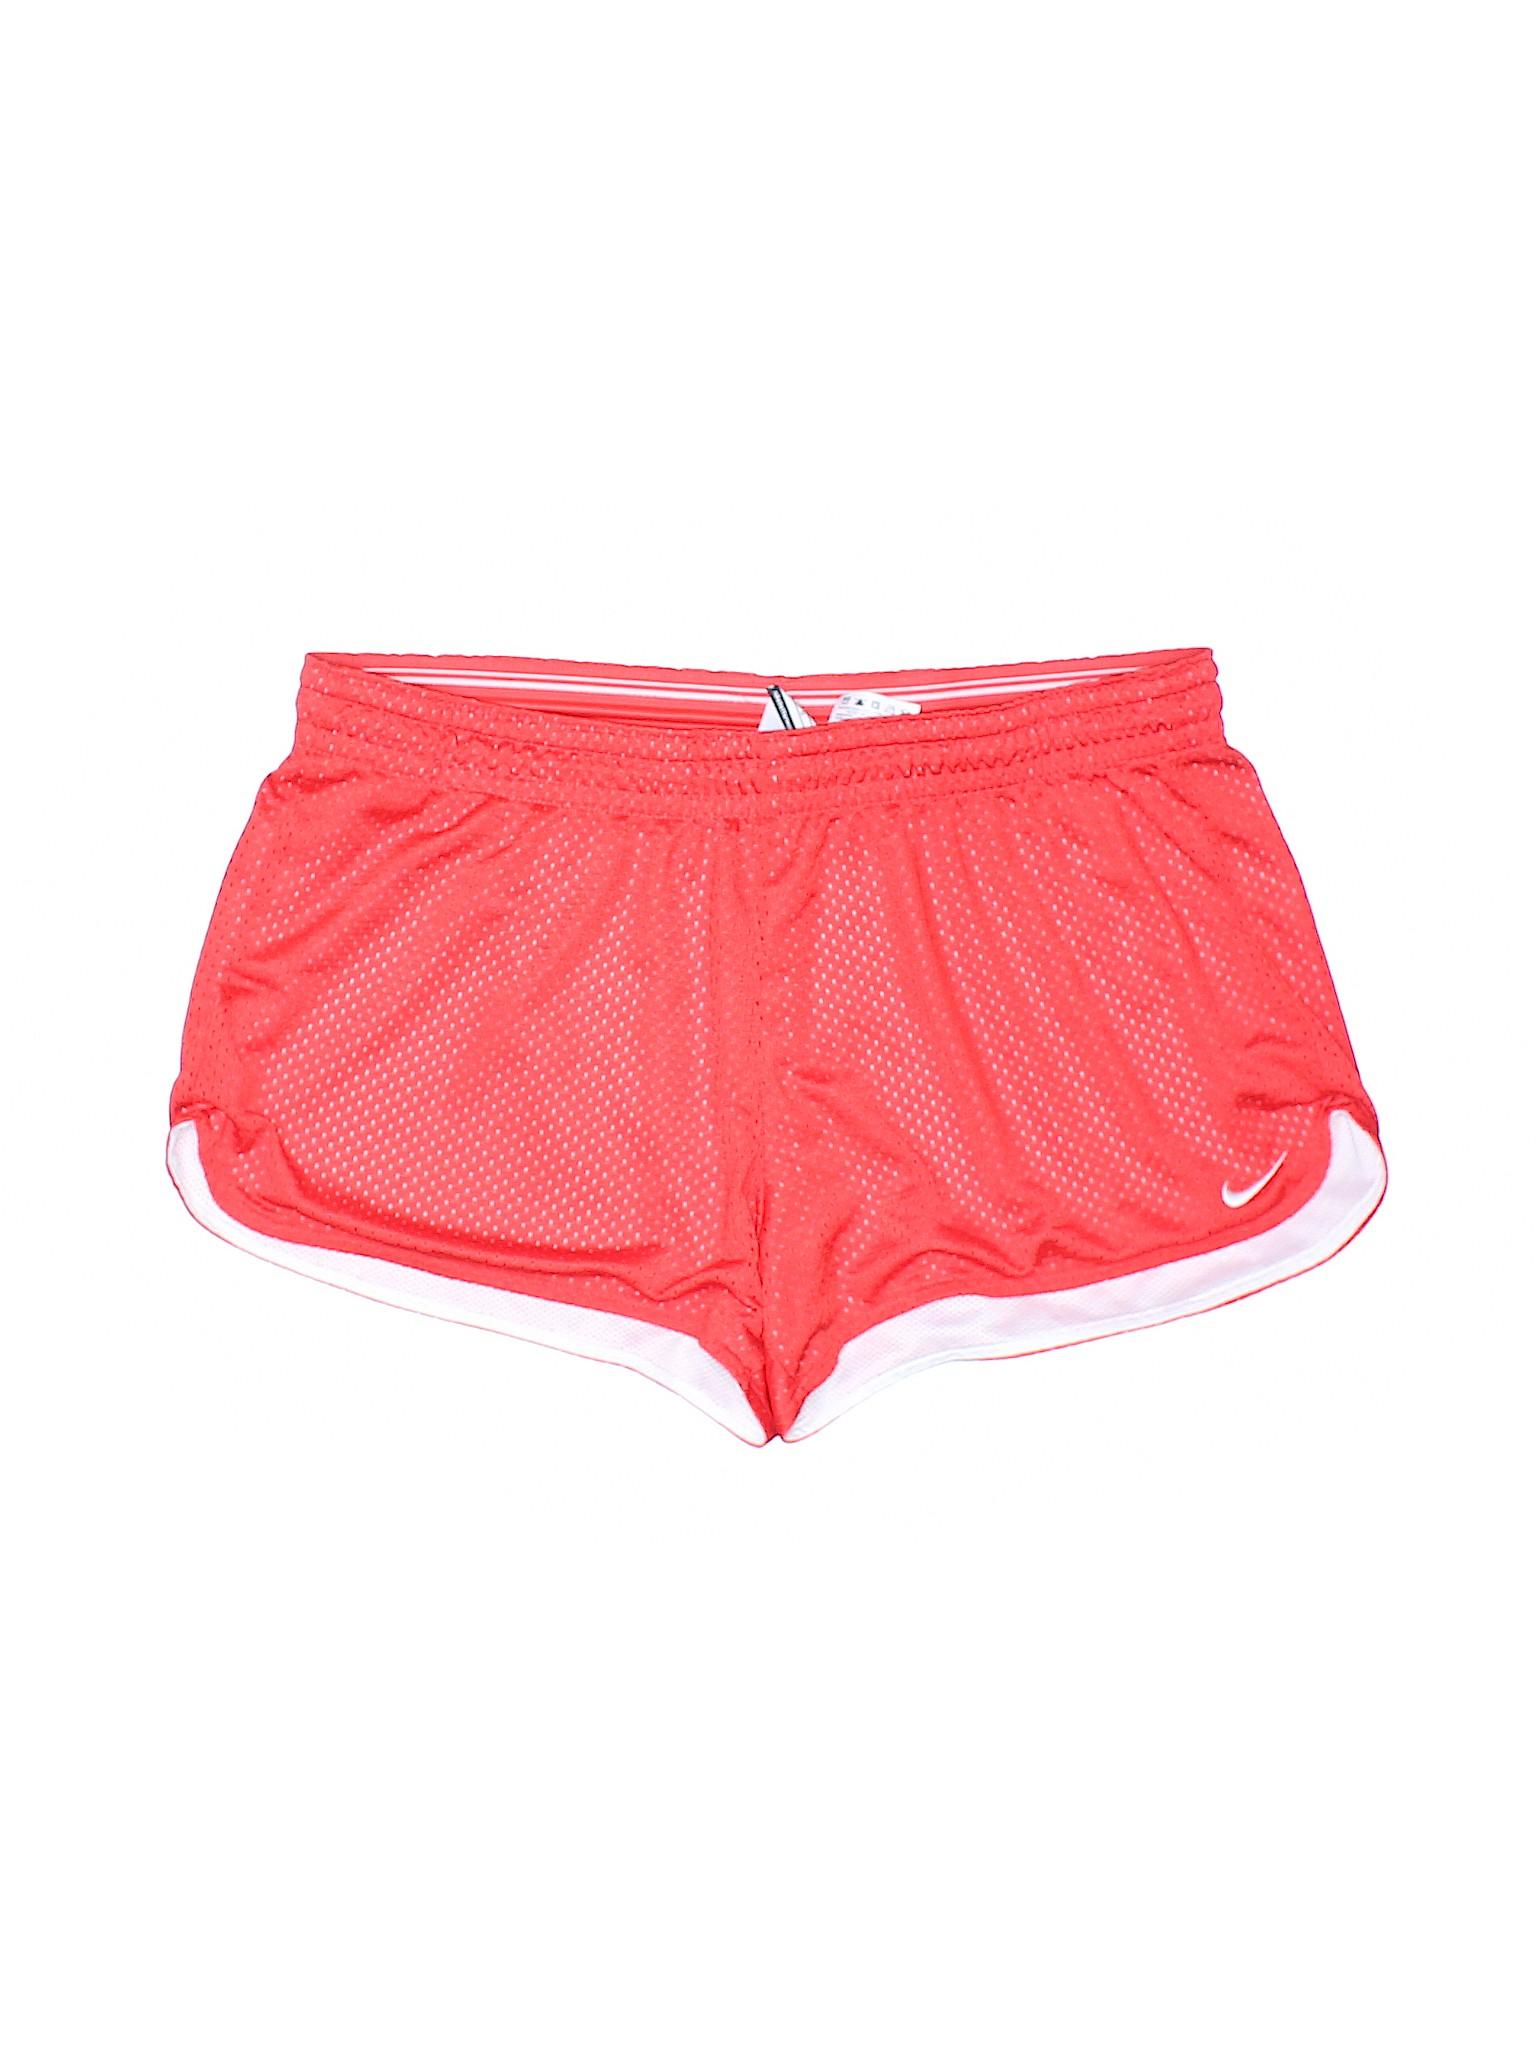 Boutique Shorts Nike Athletic Nike Boutique dOOxI7qHw